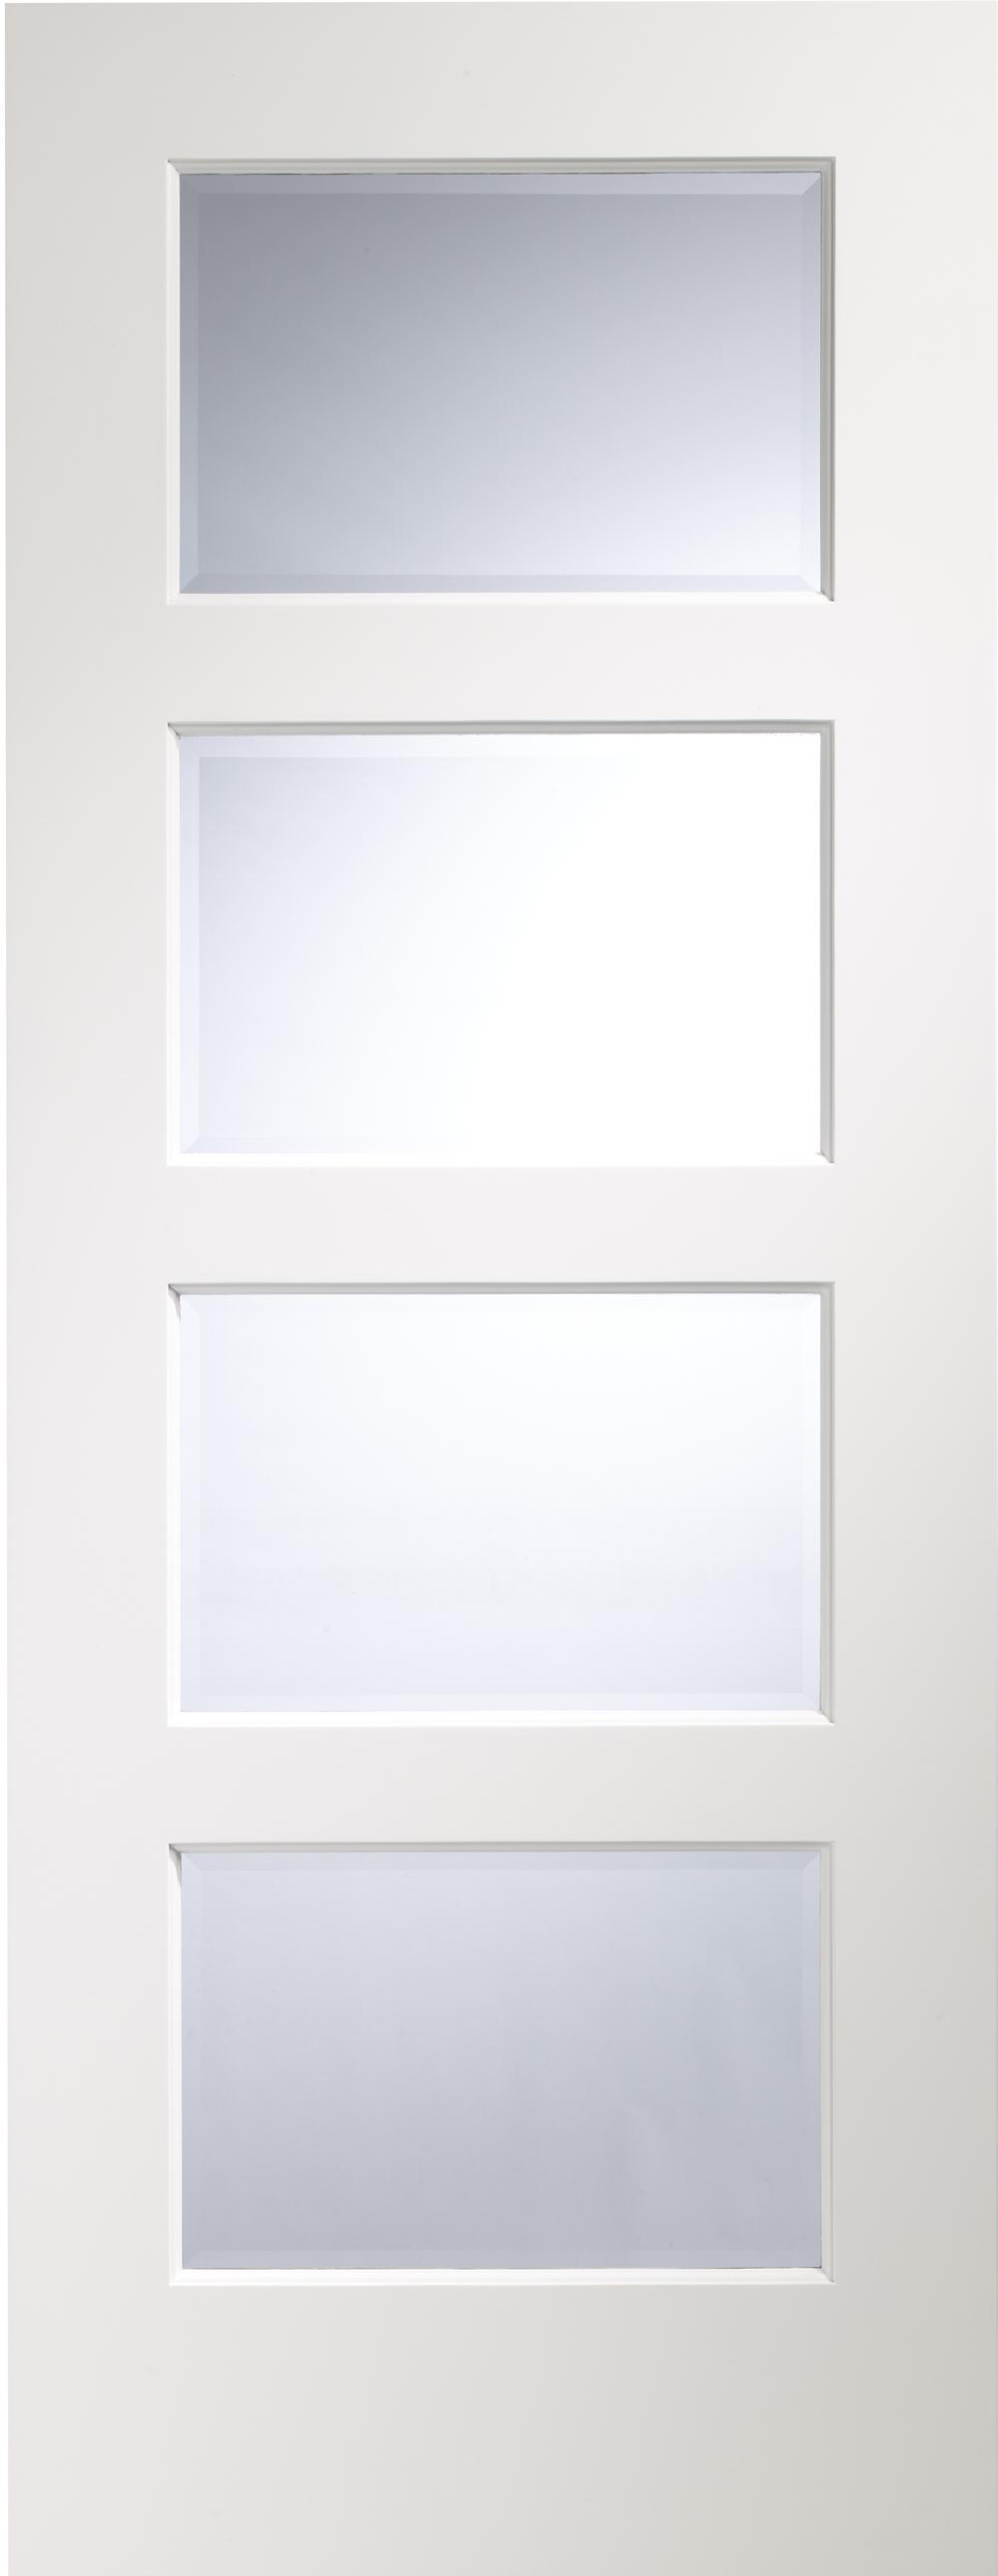 Httpsjastimberpotenza Pre Finished White Doors 2018 07